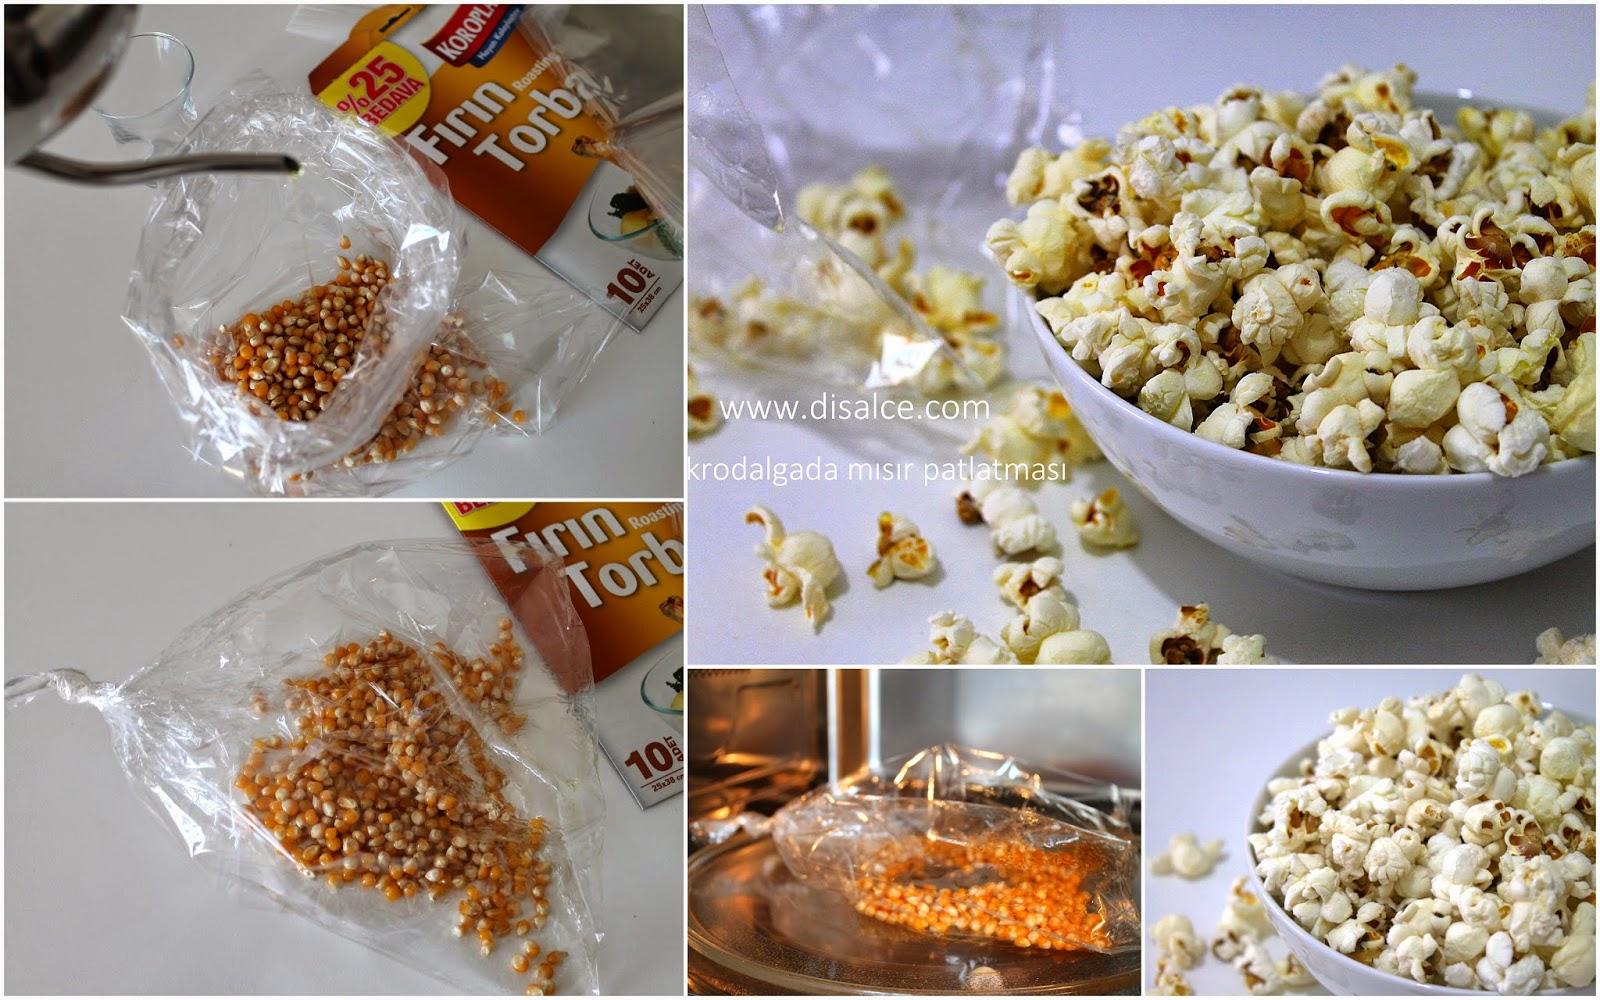 mikrodalgada mısır patlatma